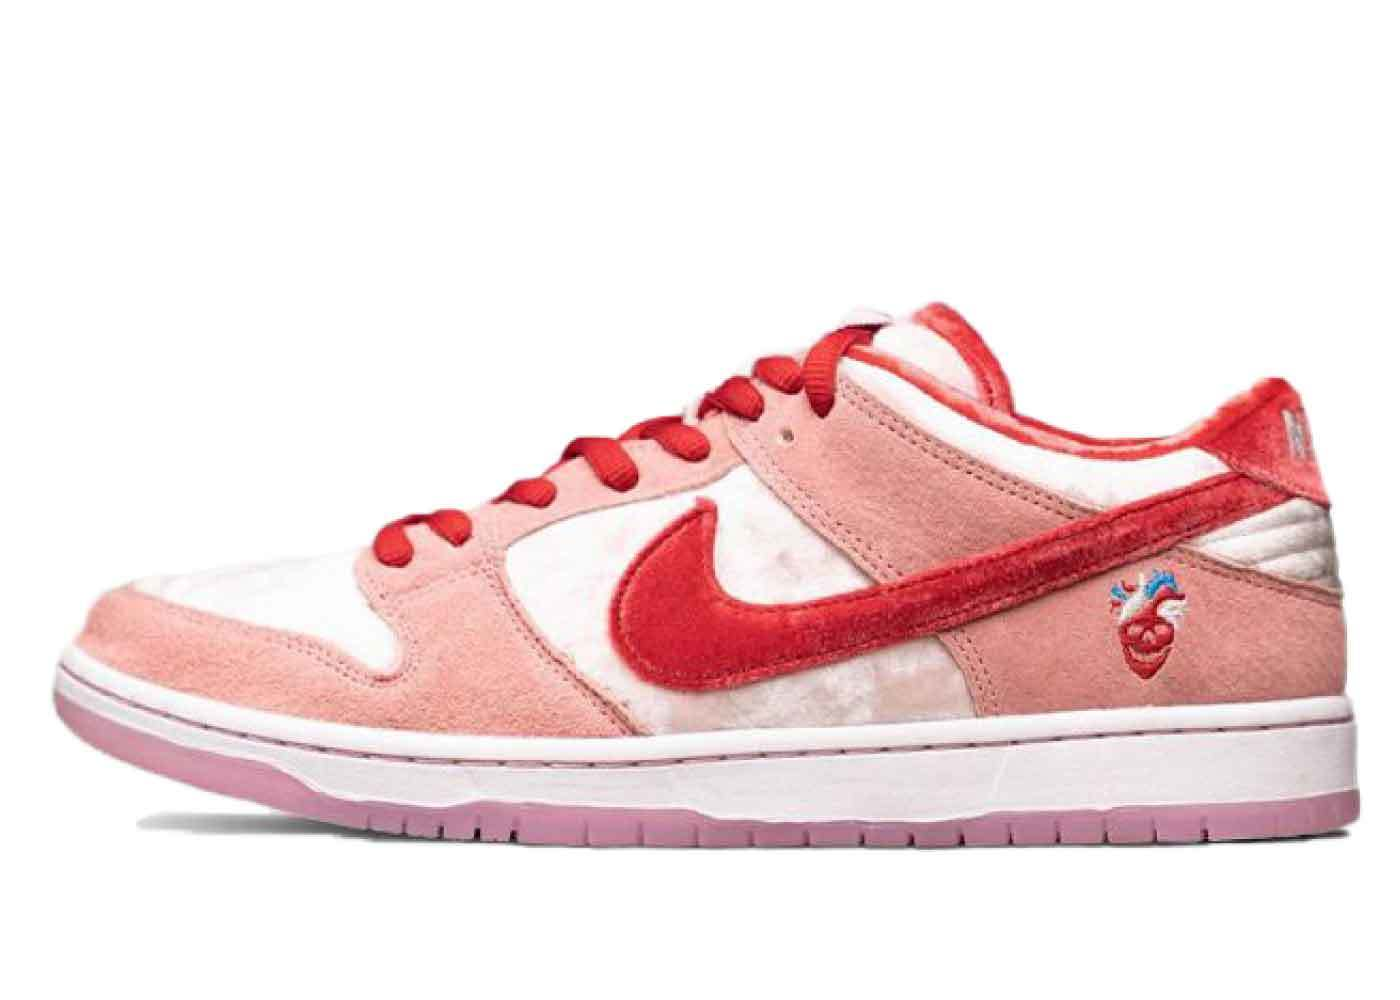 StrangeLove x Nike SB Dunk Low Valentine Dayの写真